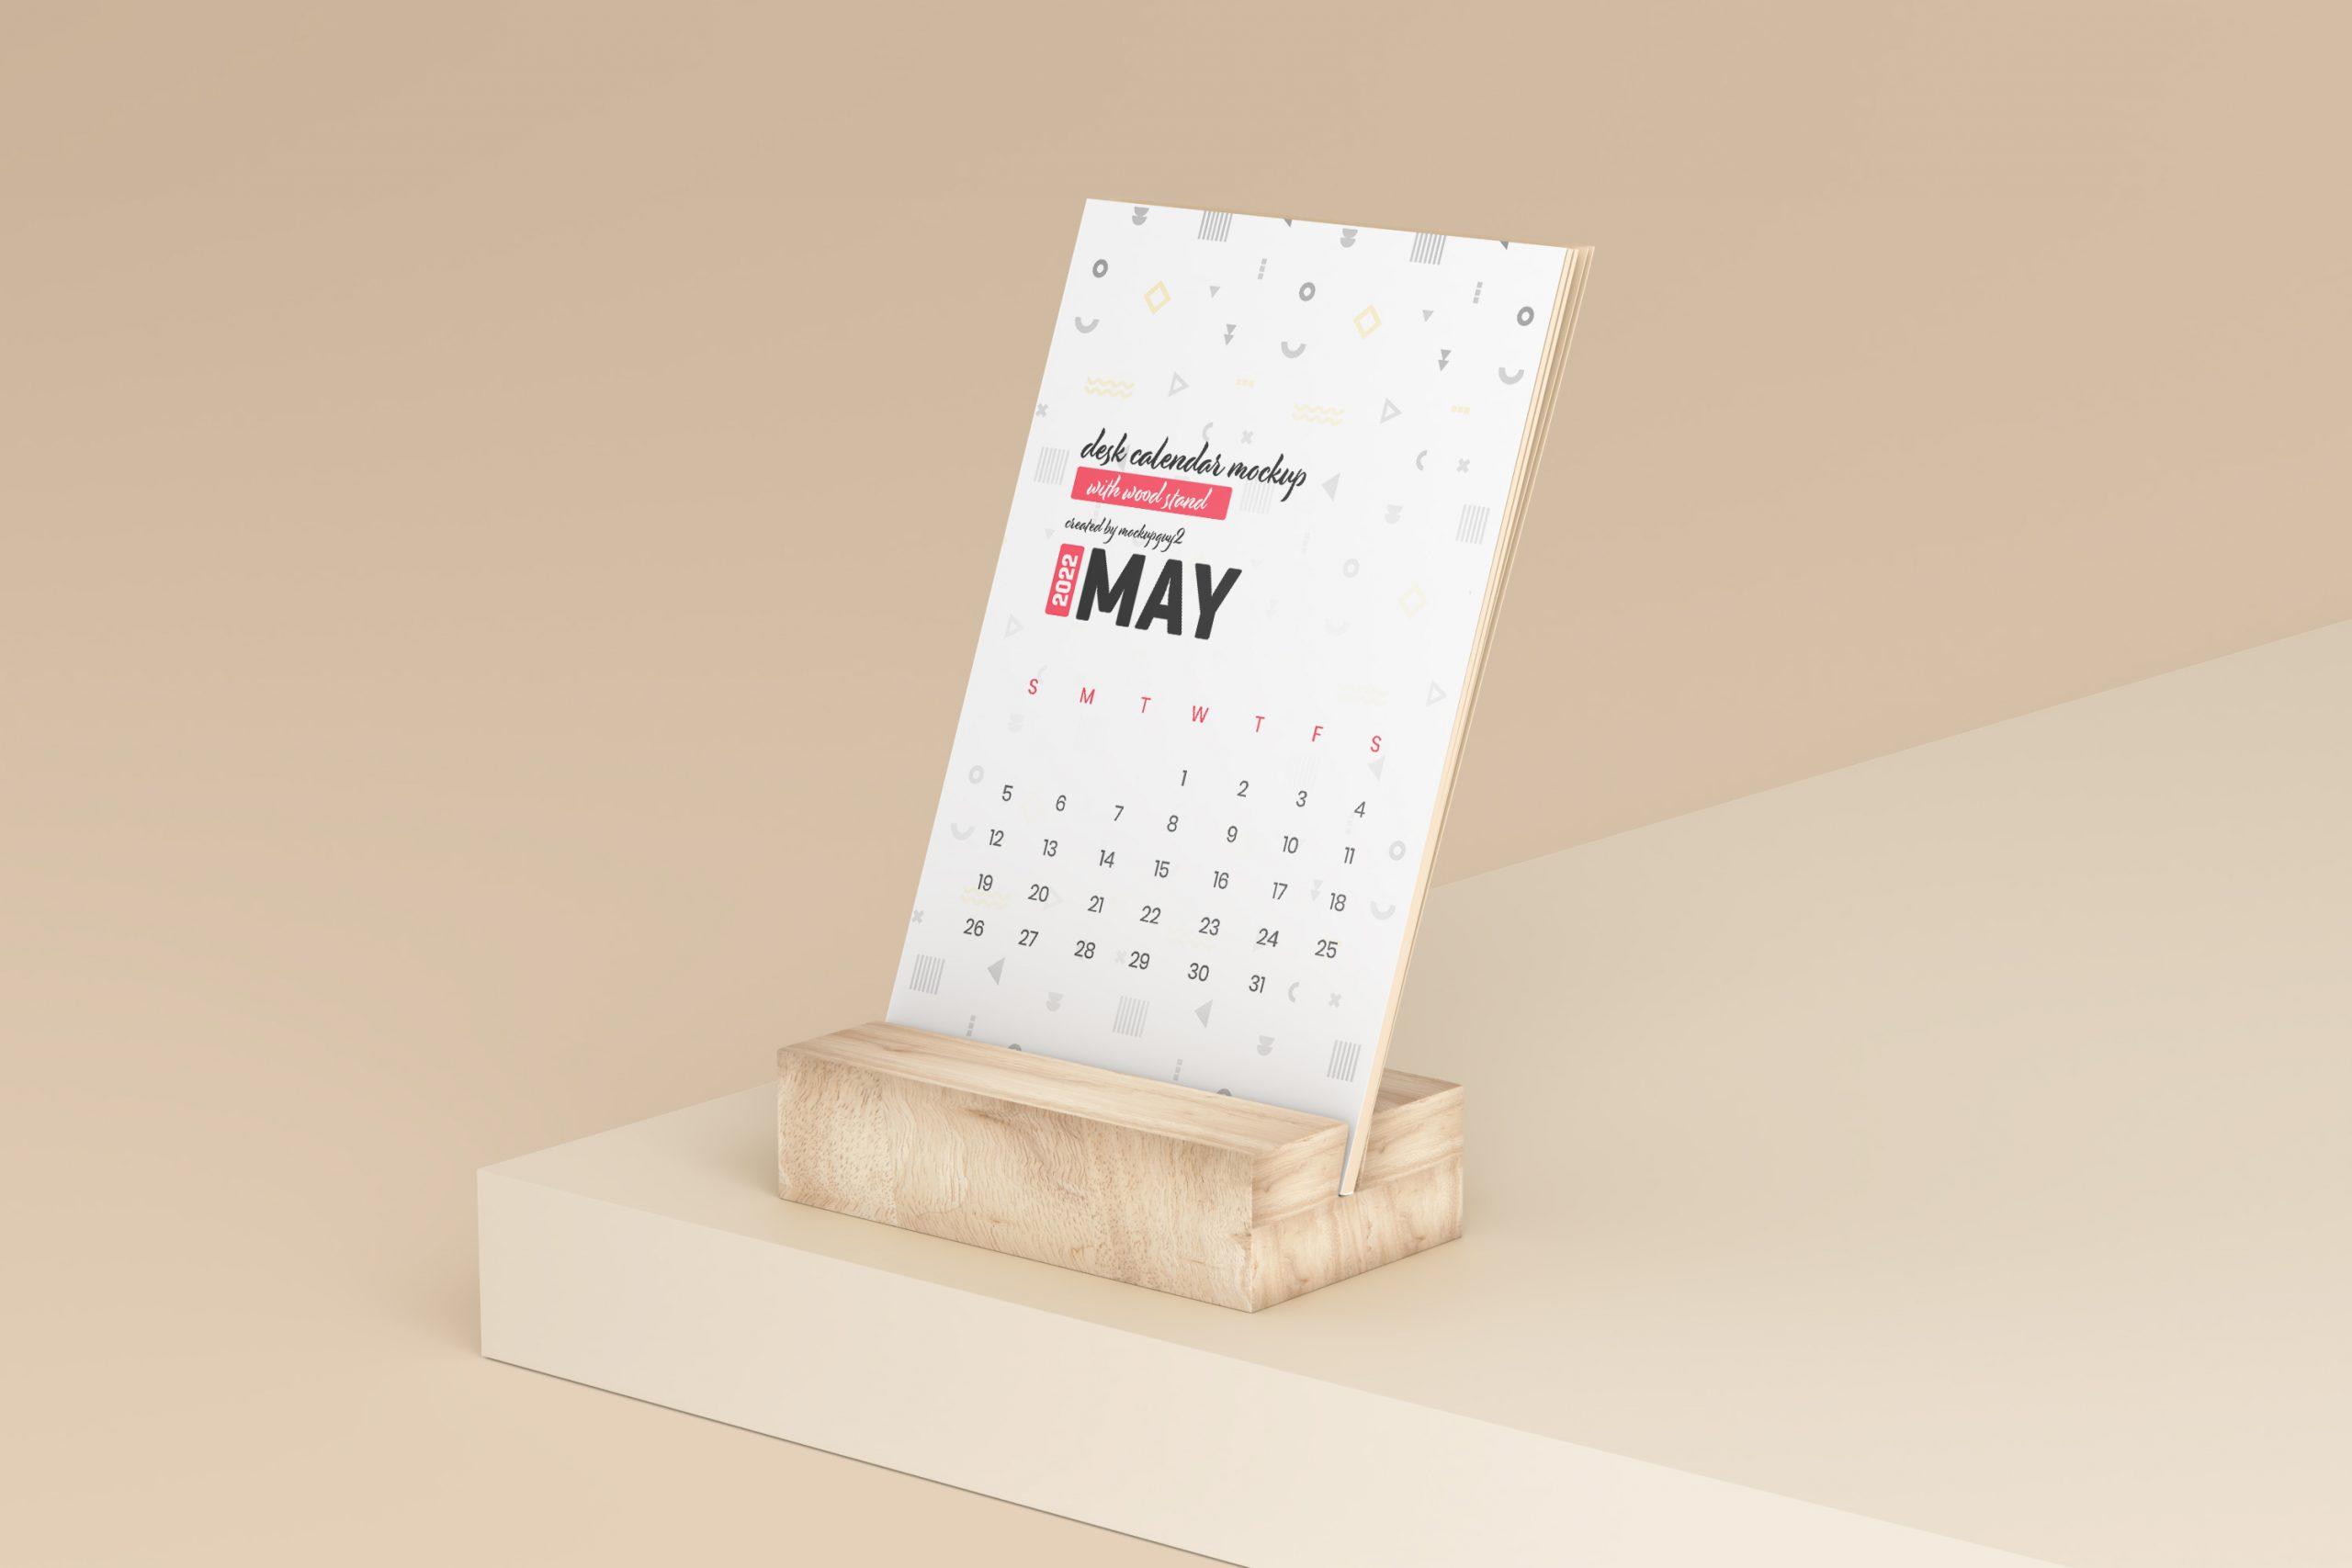 Desk Calendar With Wood Stand Mockup